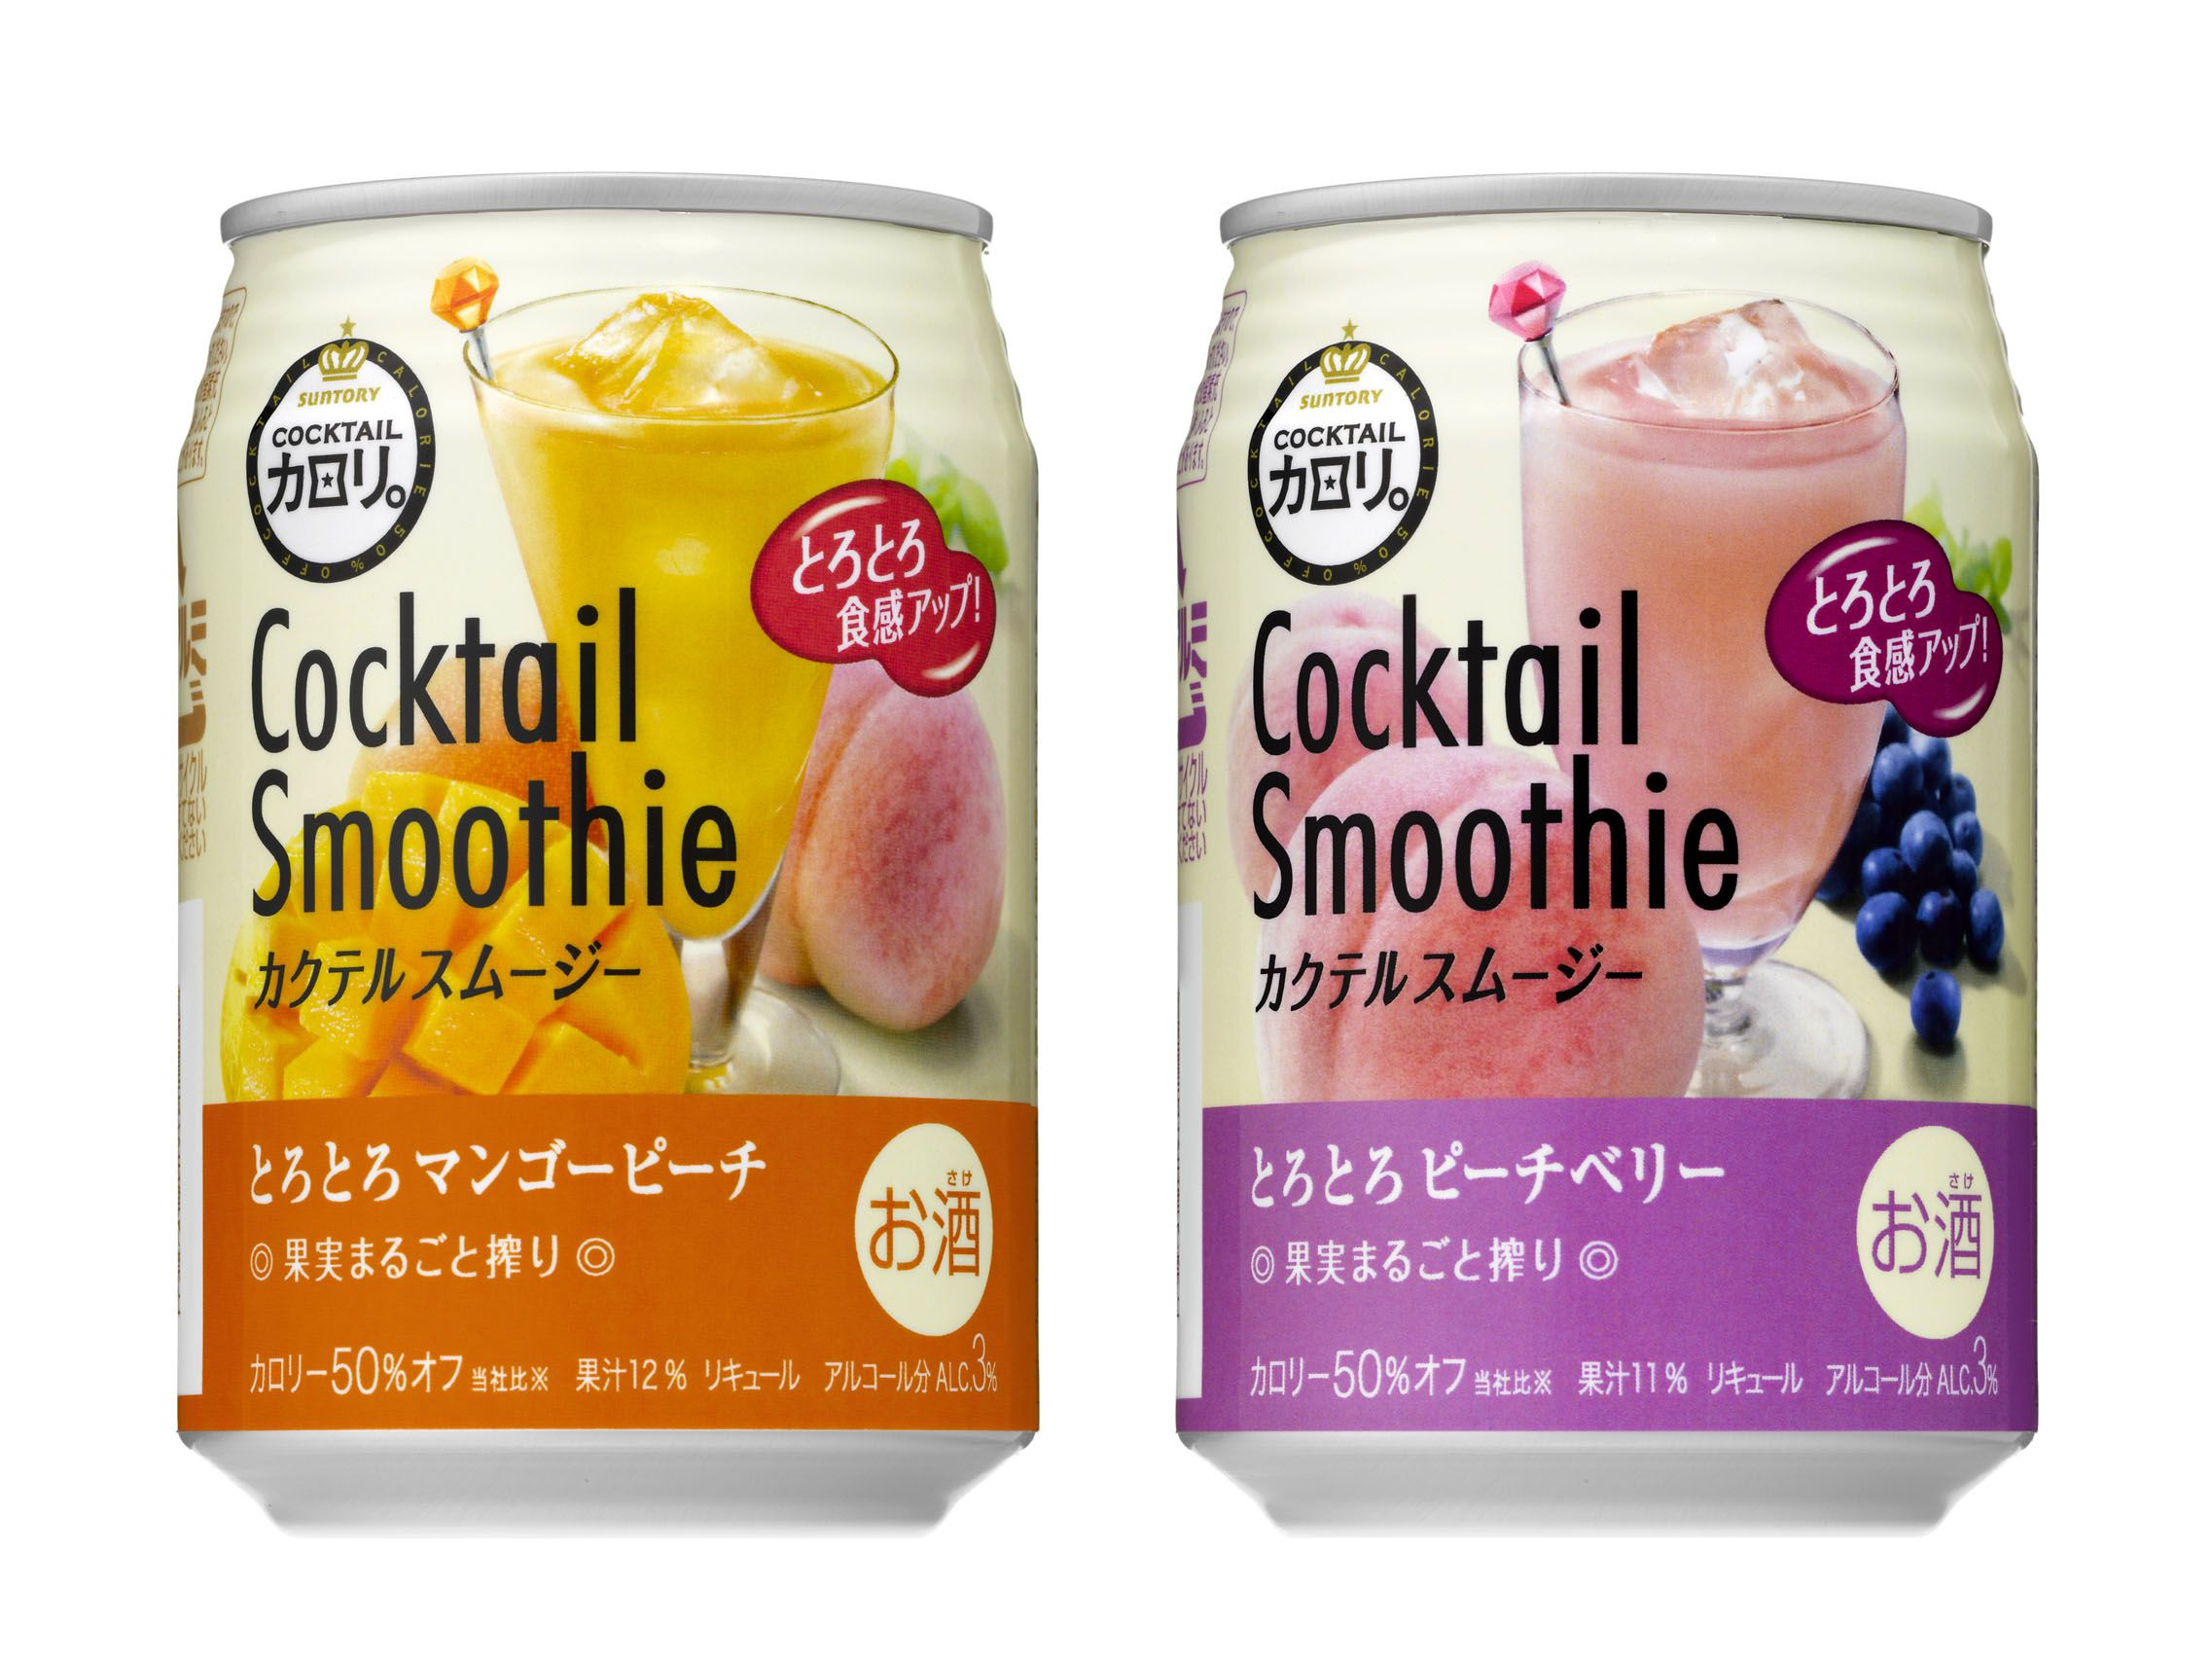 http//www.suntory.co.jp/news/2013/l_img/l_119161.jpg(画像